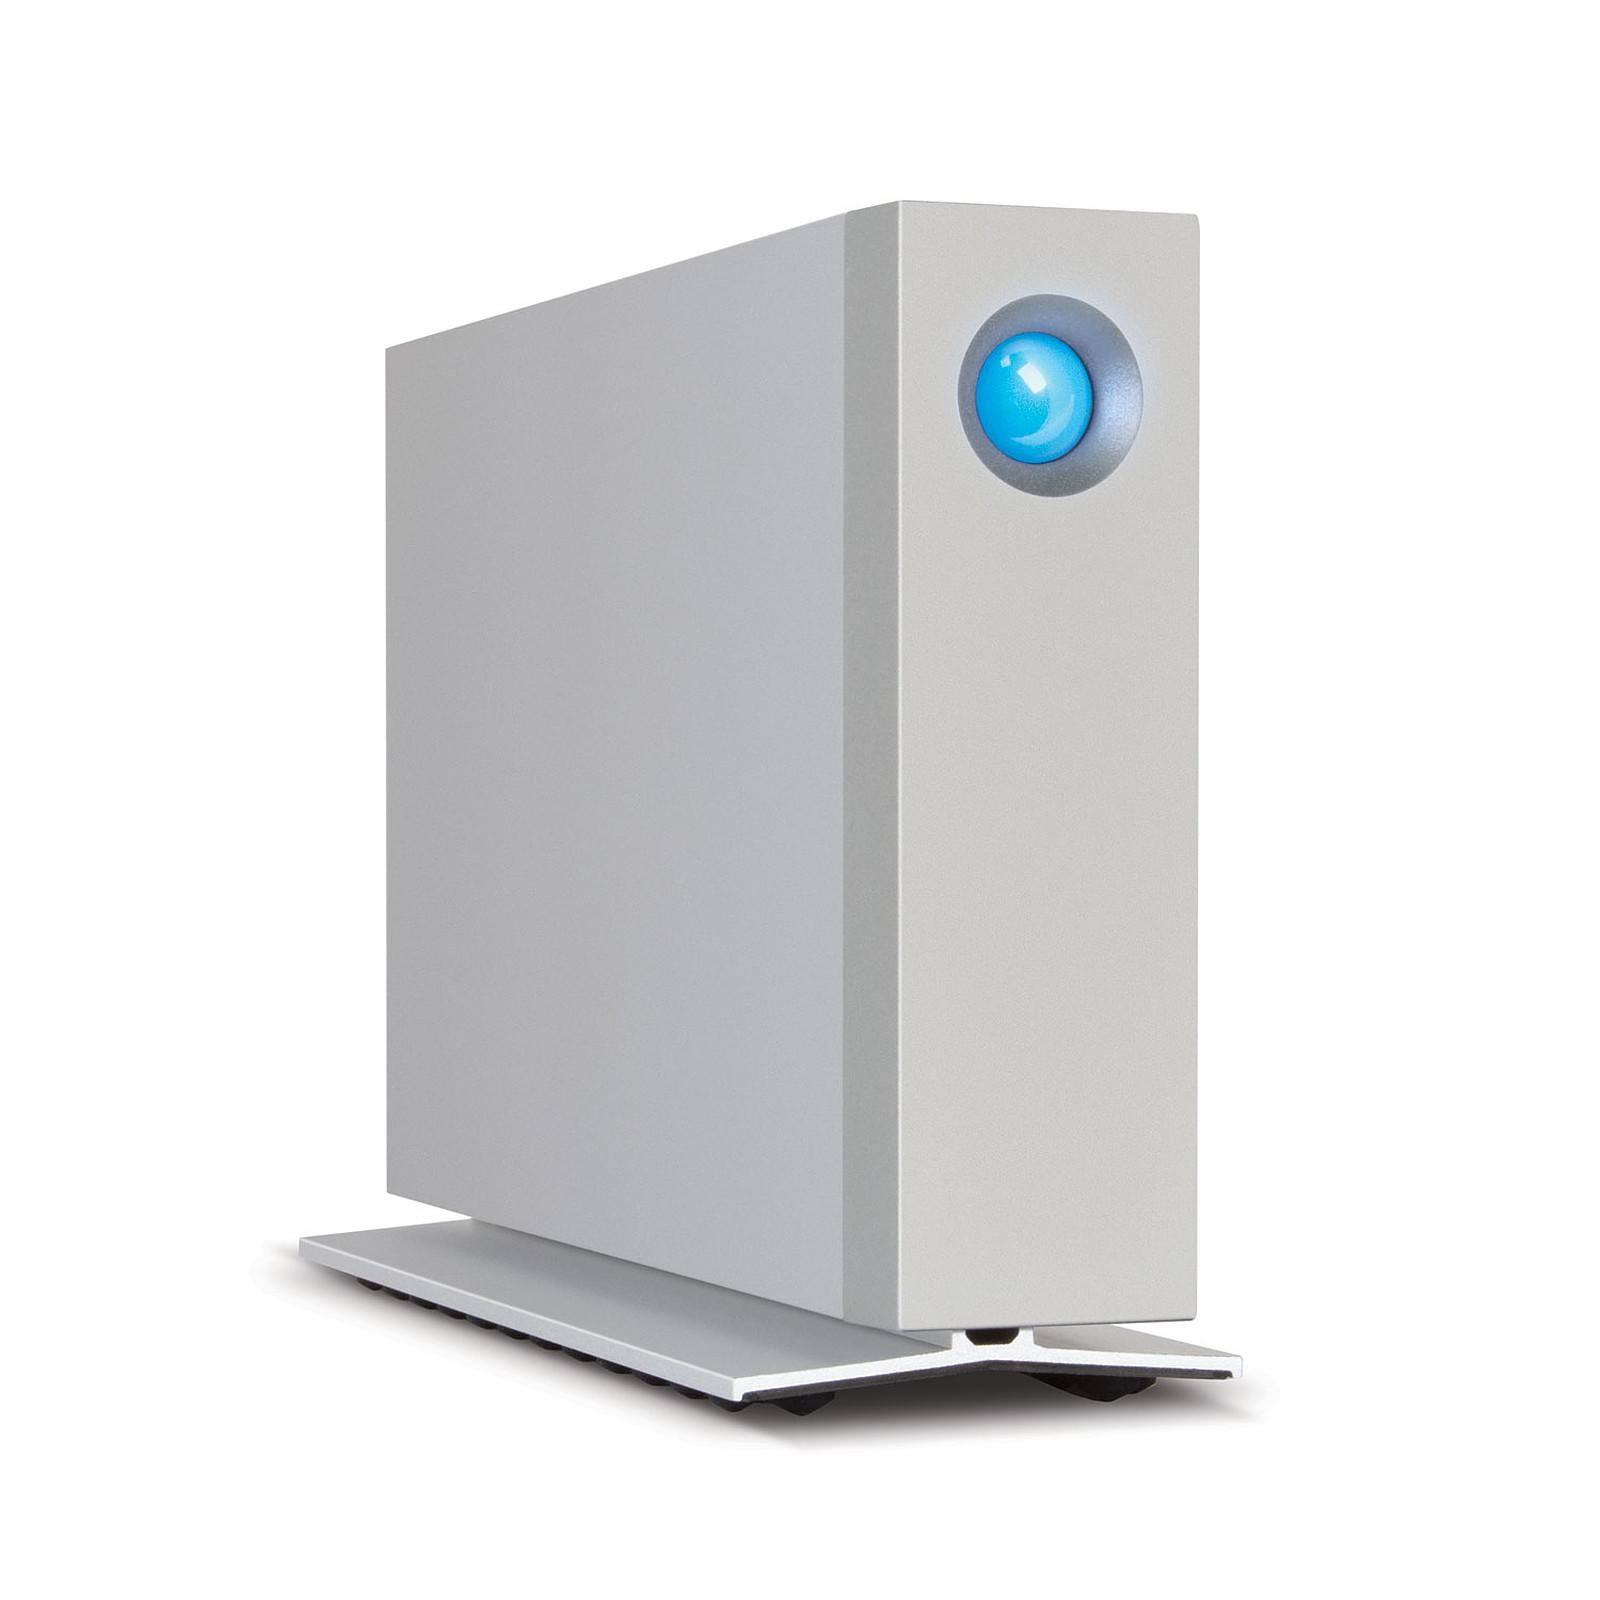 LaCie d2 USB 3.0 (4 To)